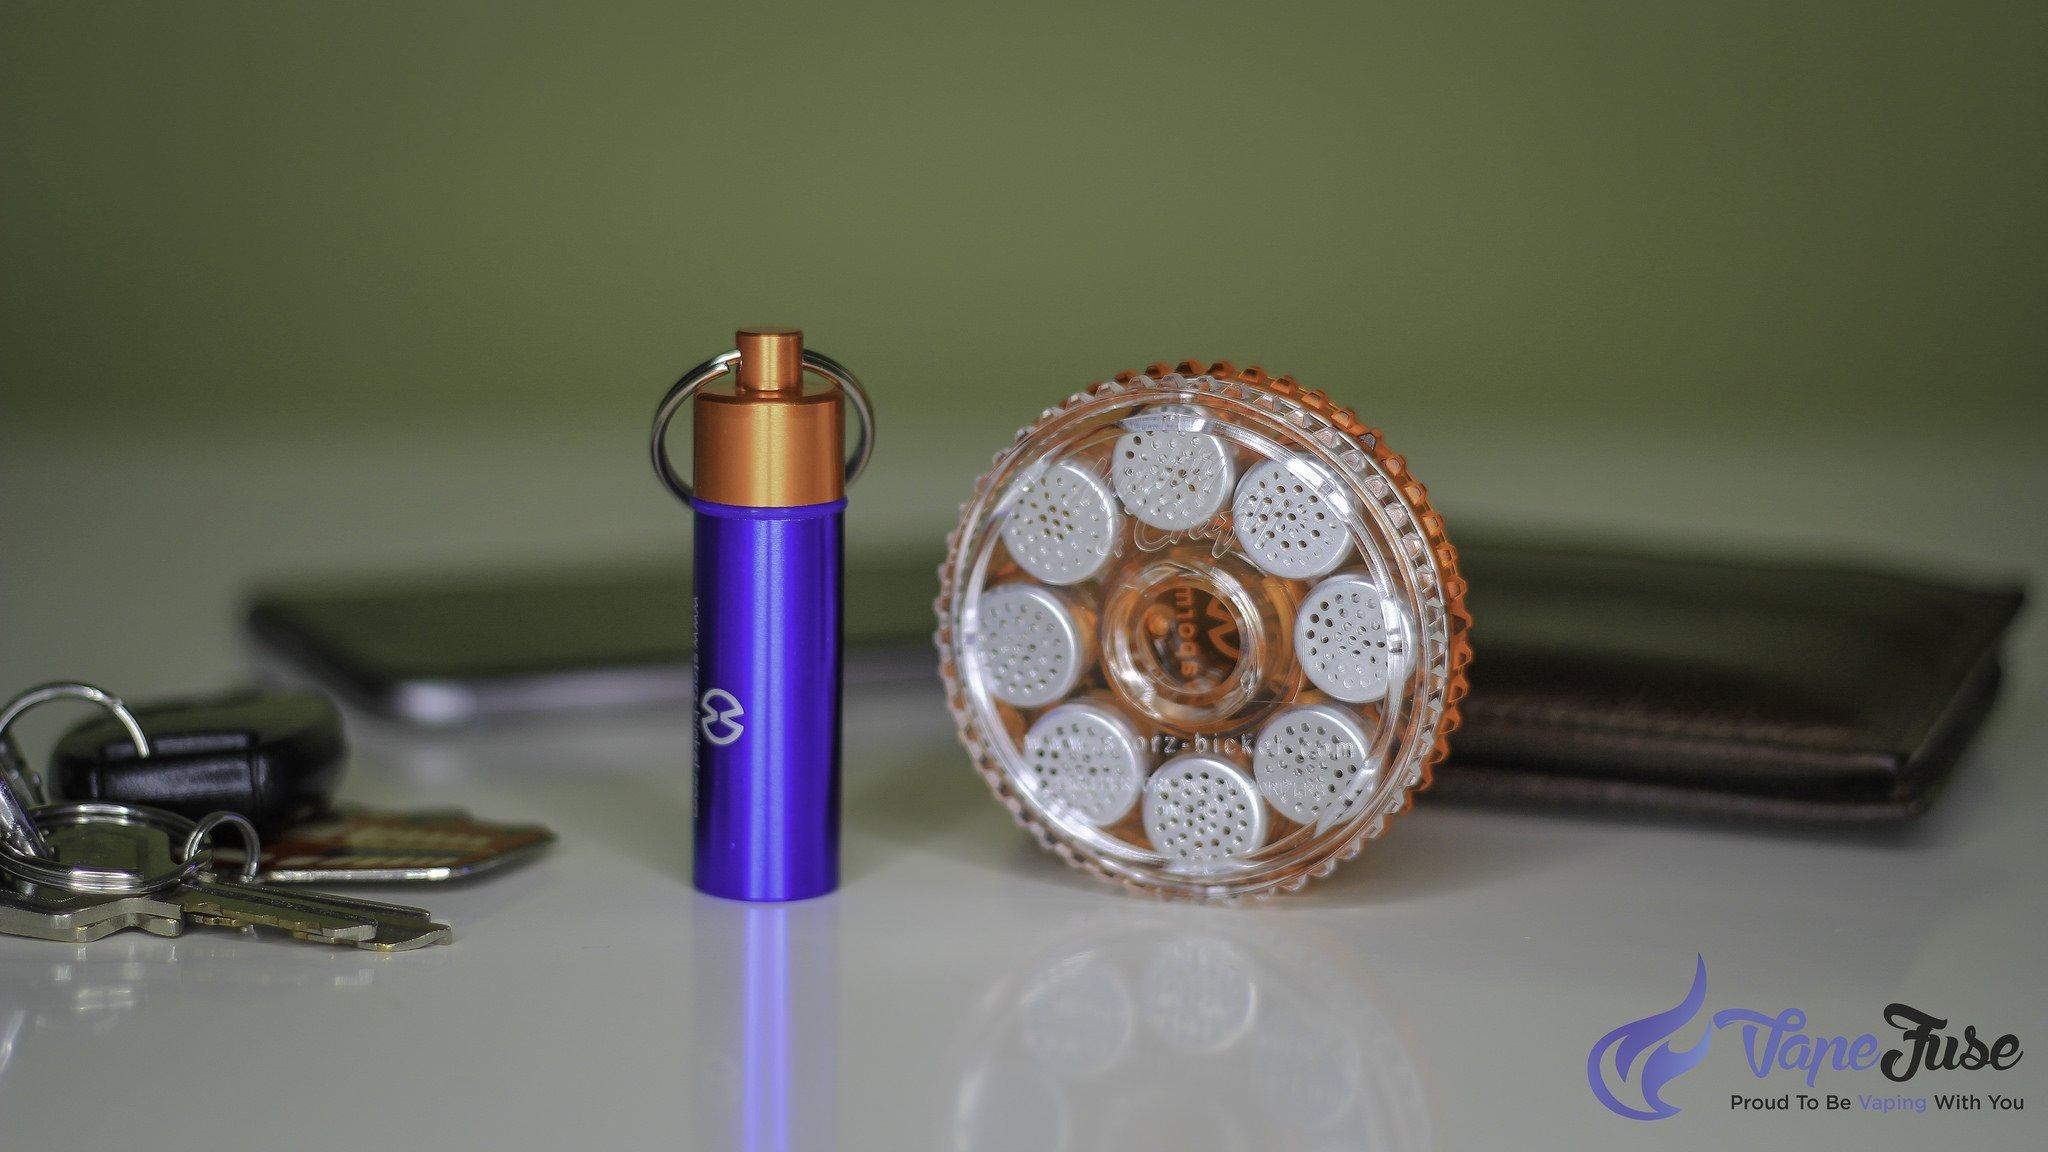 Storz & Bickel dosing capsules